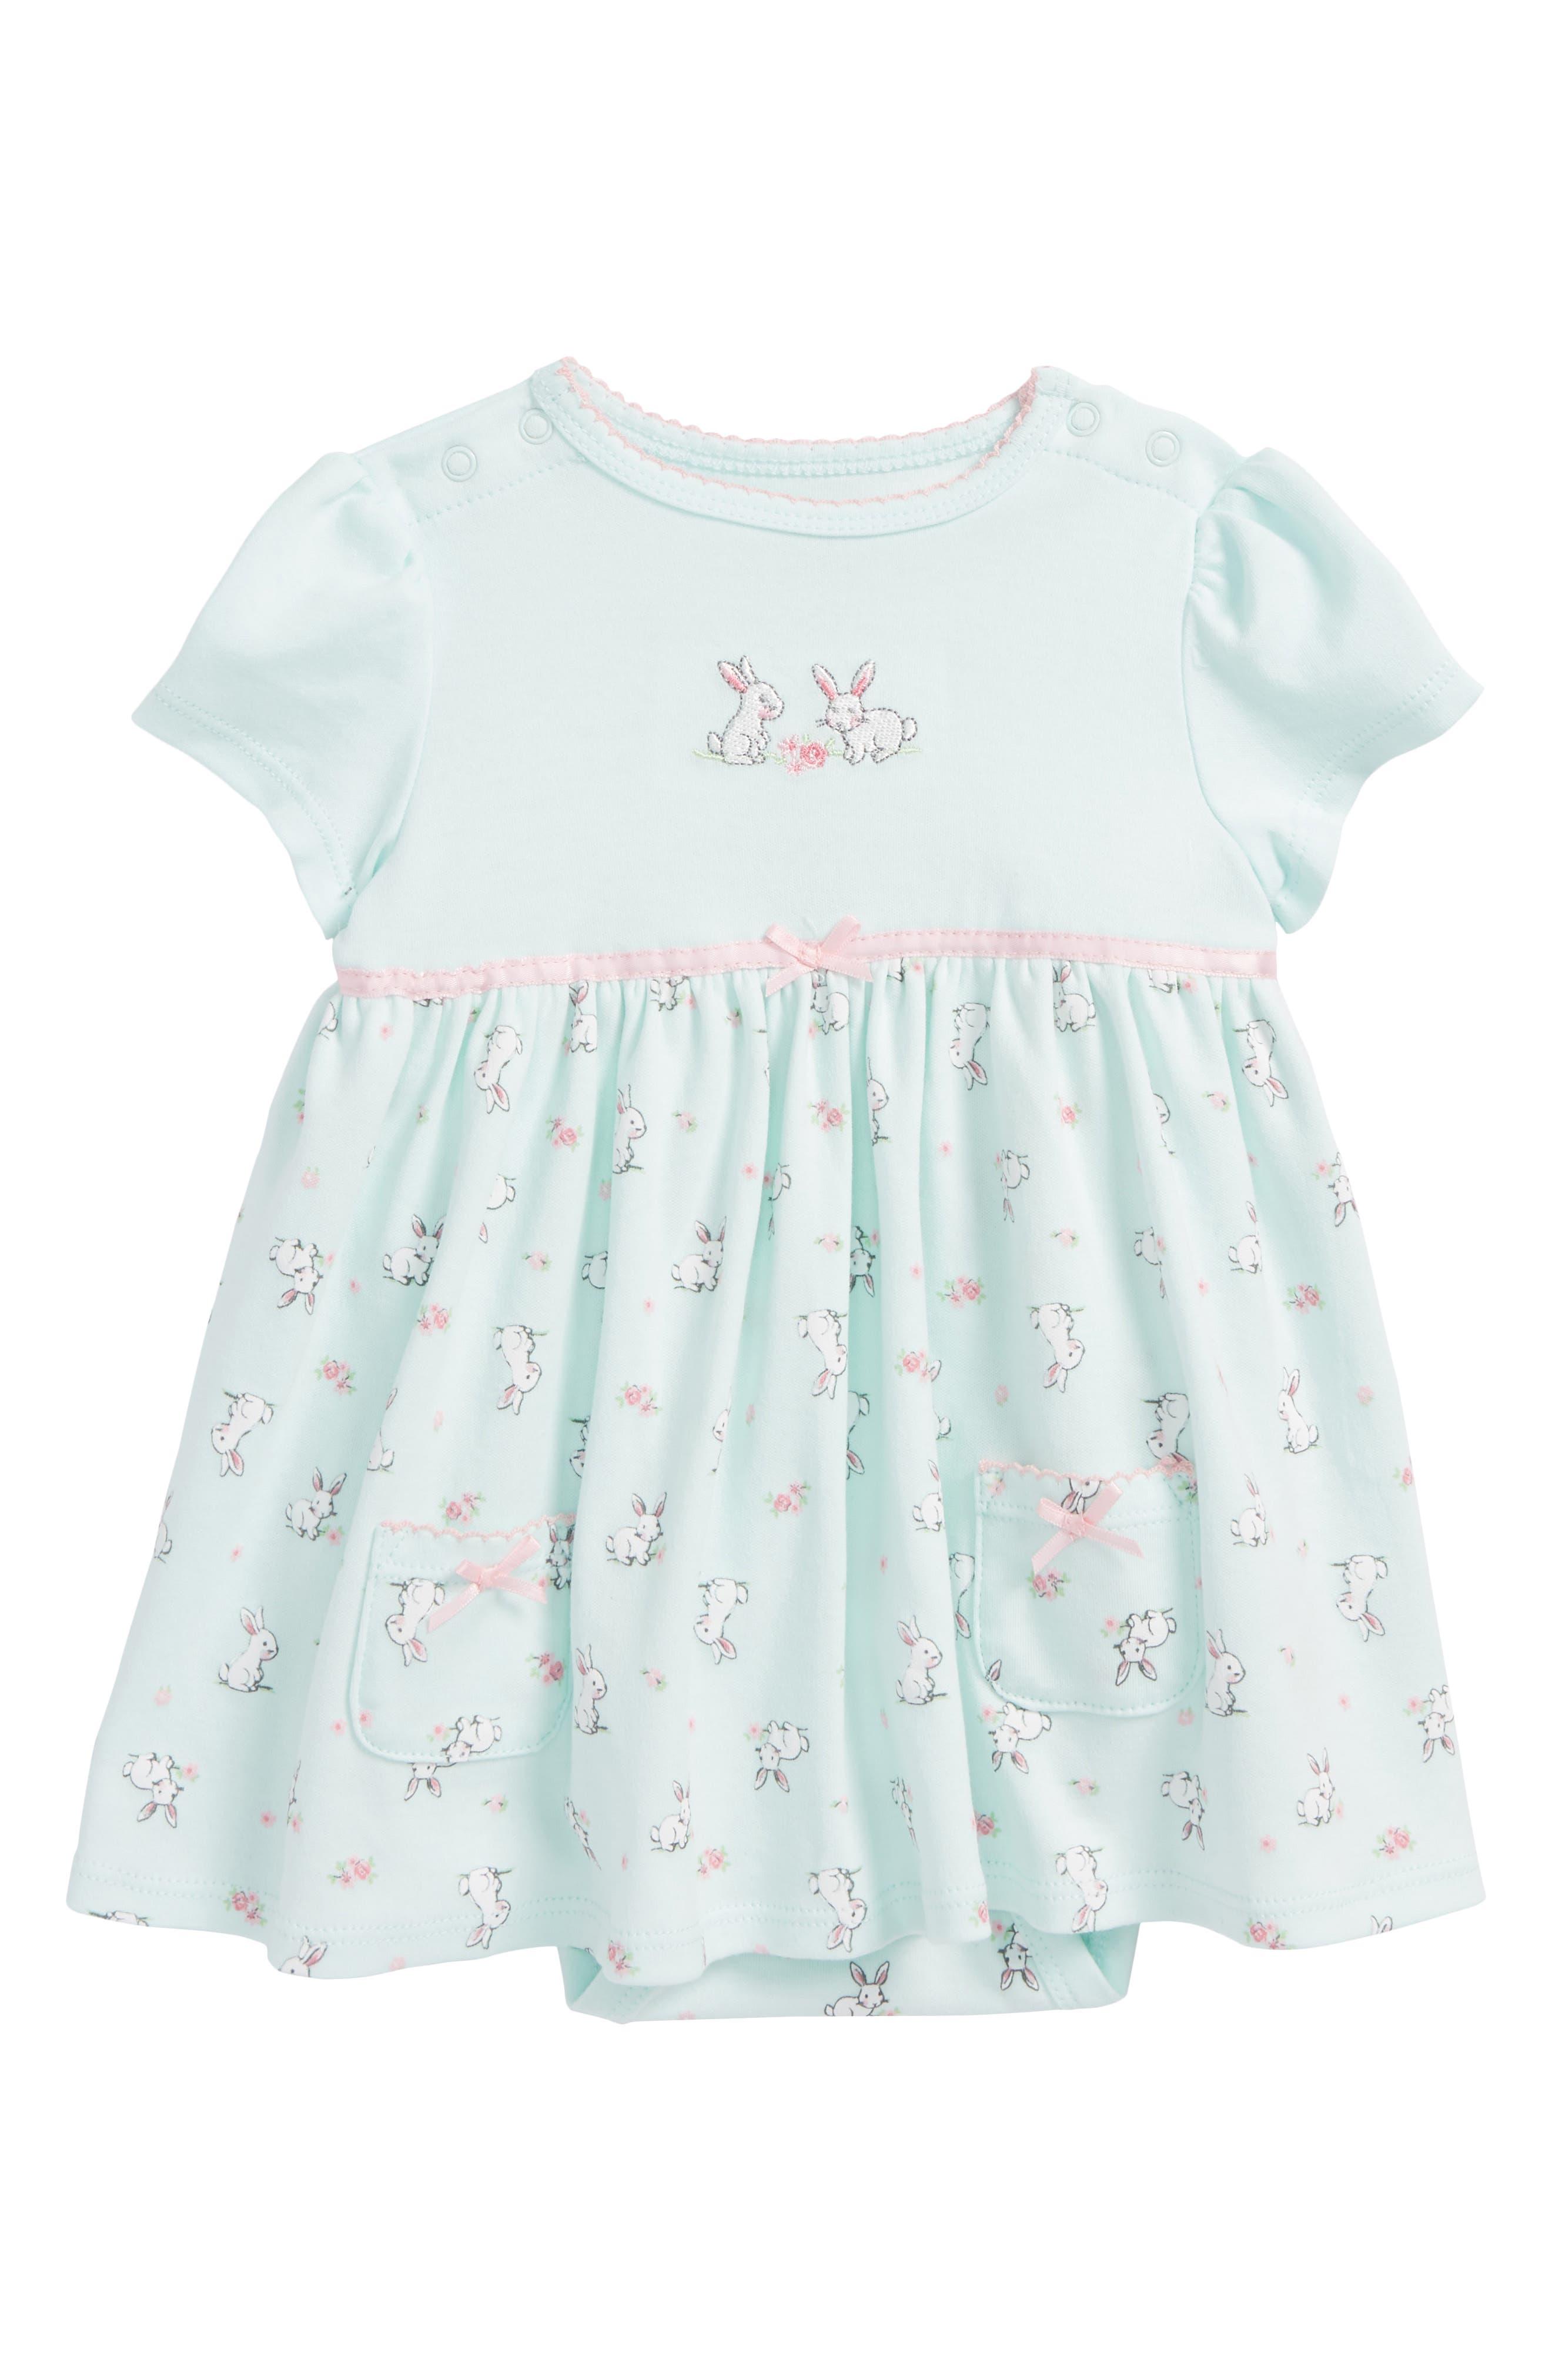 Main Image - Little Me Bunnies Skirted Bodysuit (Baby Girls)